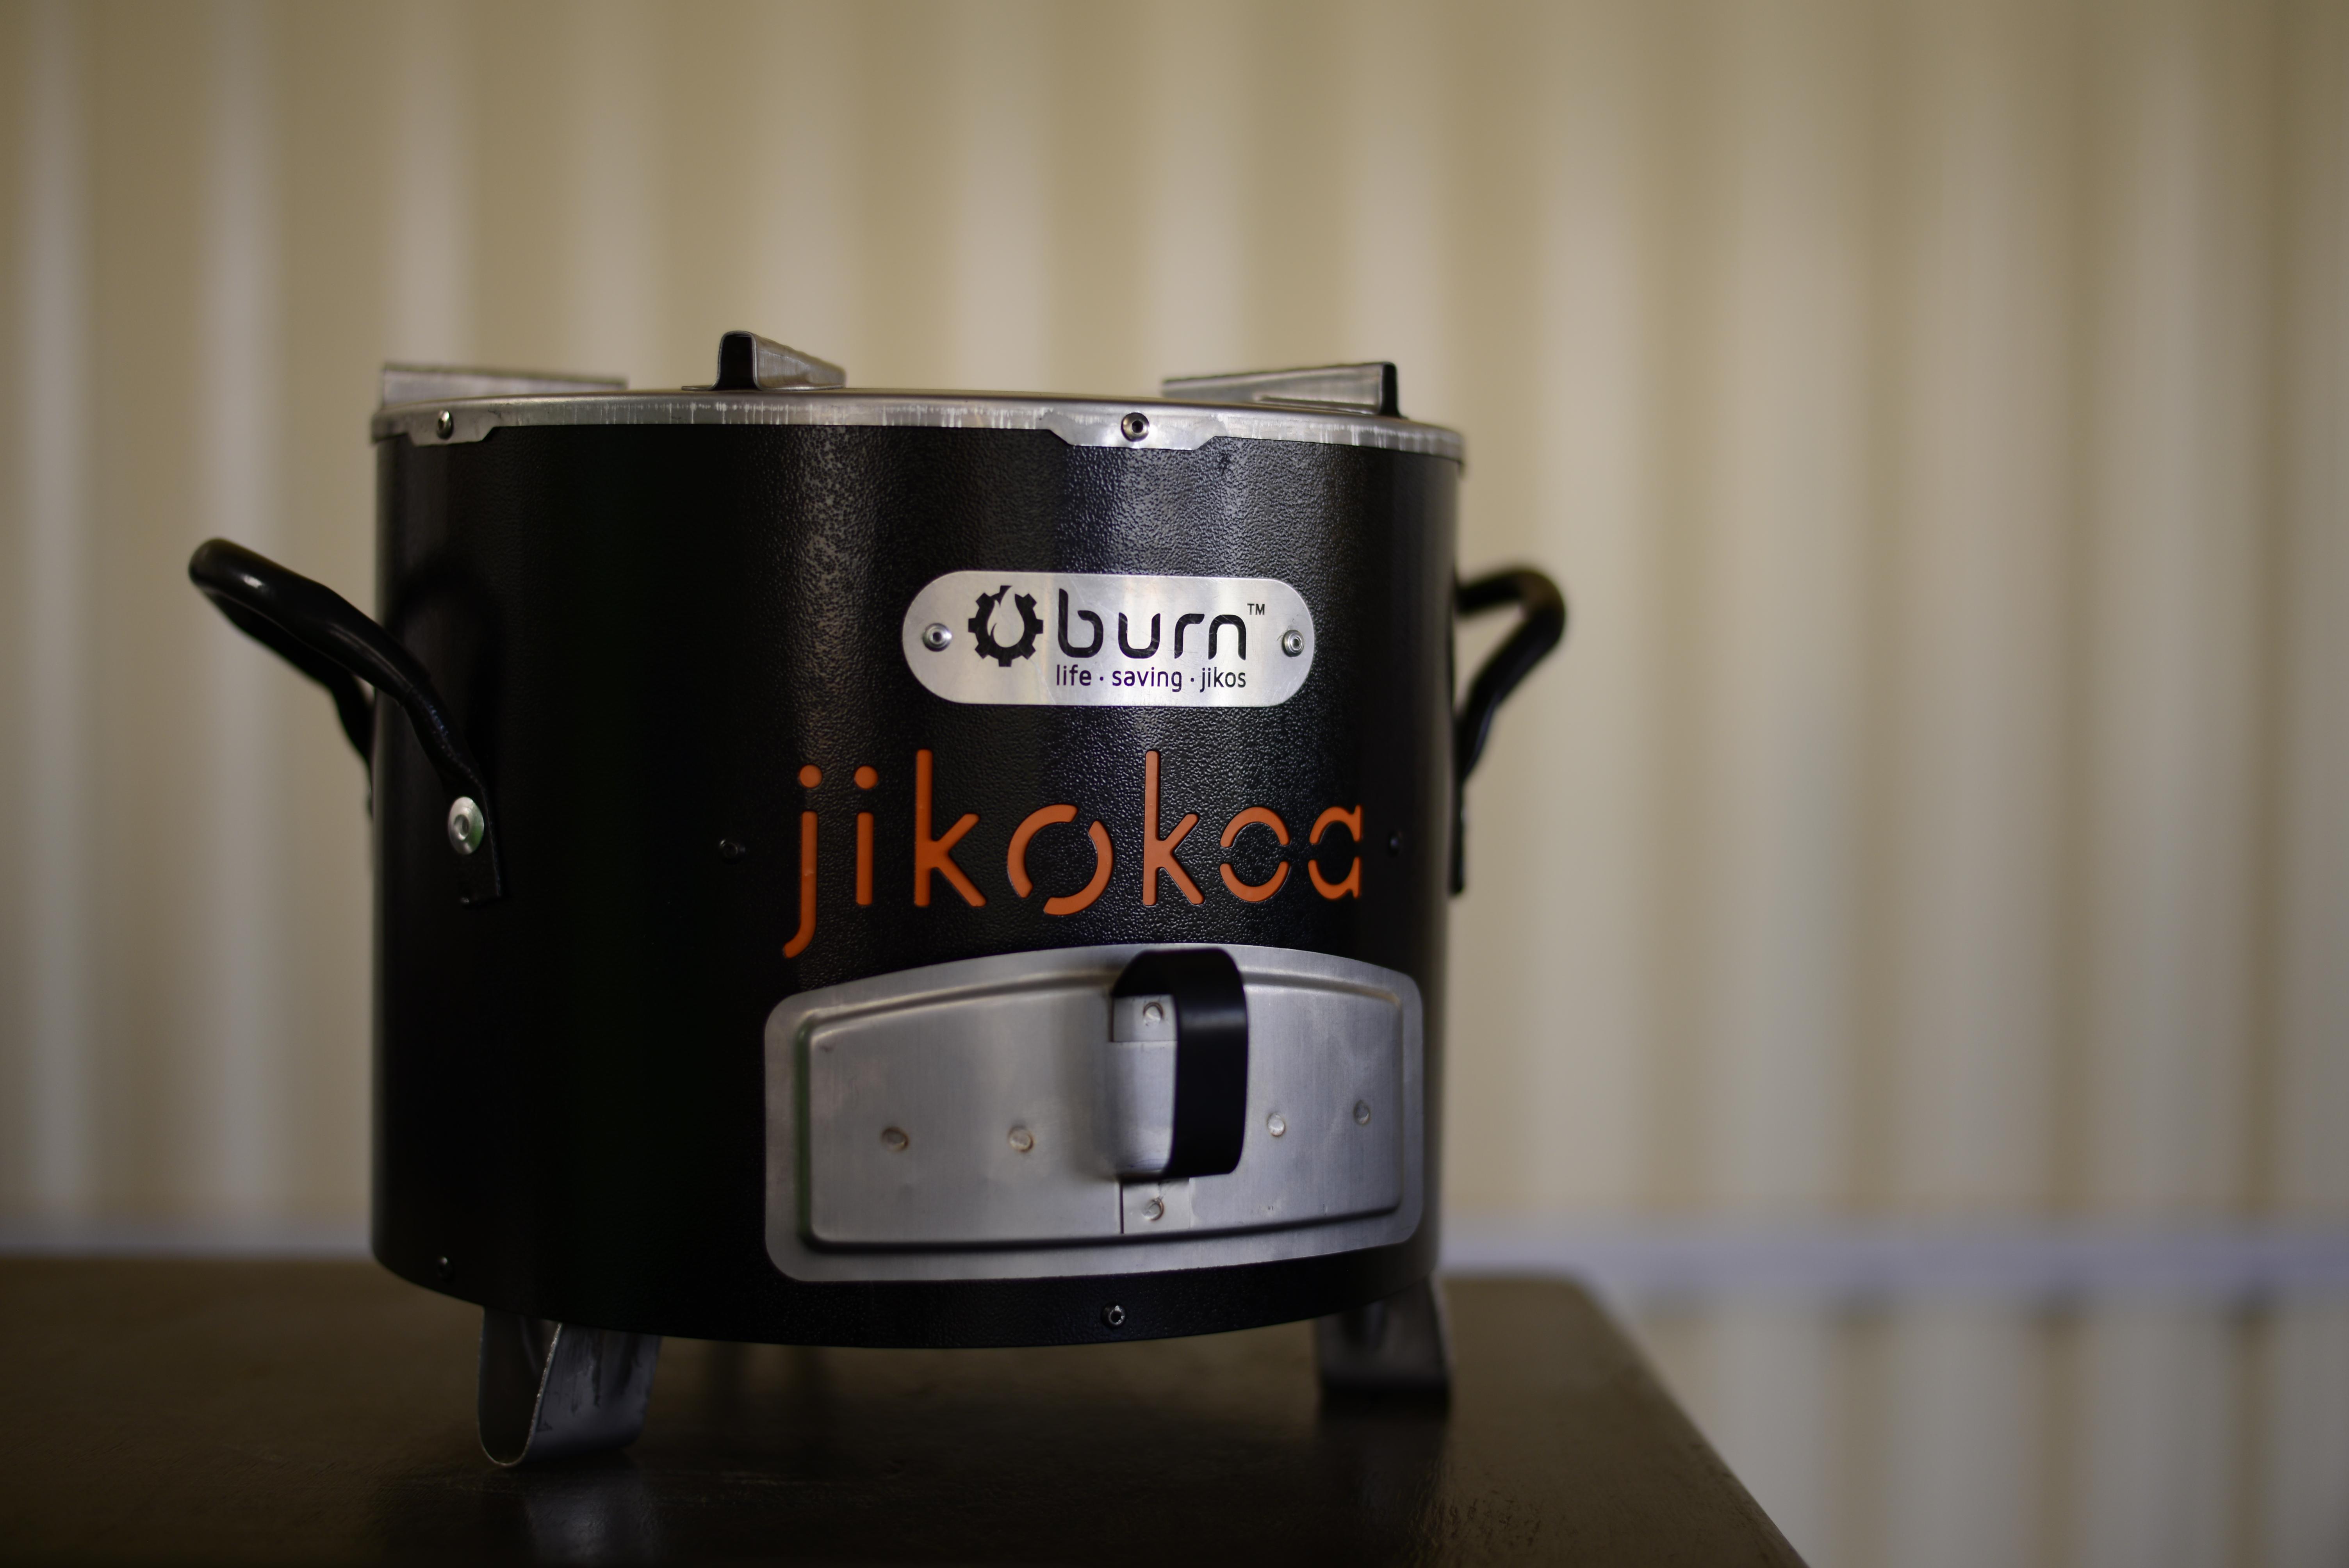 Close up of the Jikokoa stove